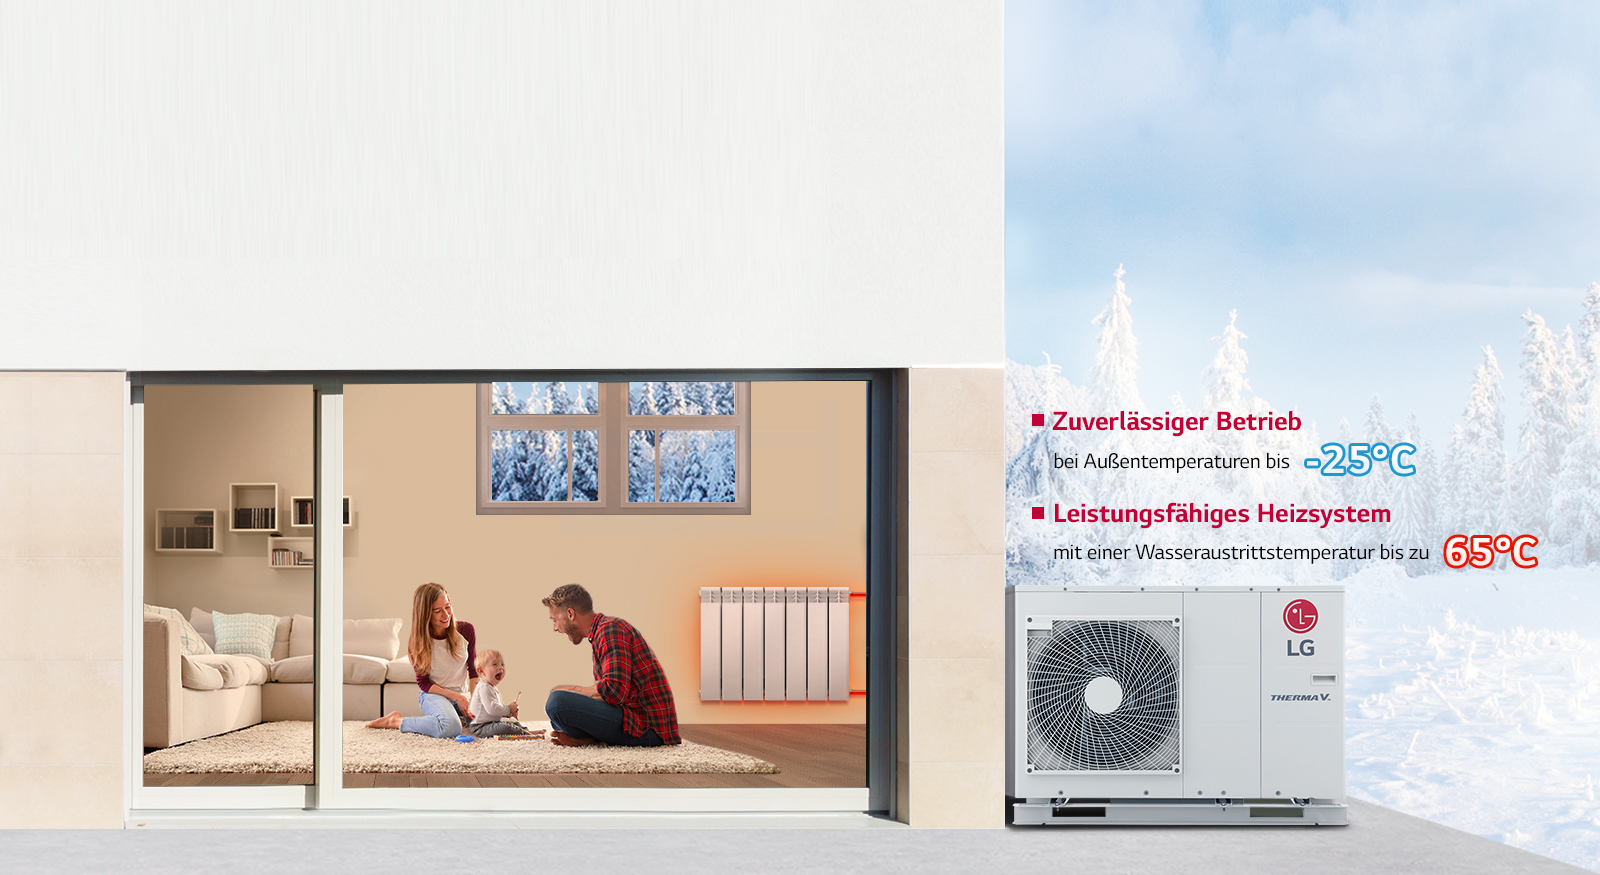 LG Wärmepumpe heizung Therma V monobloc